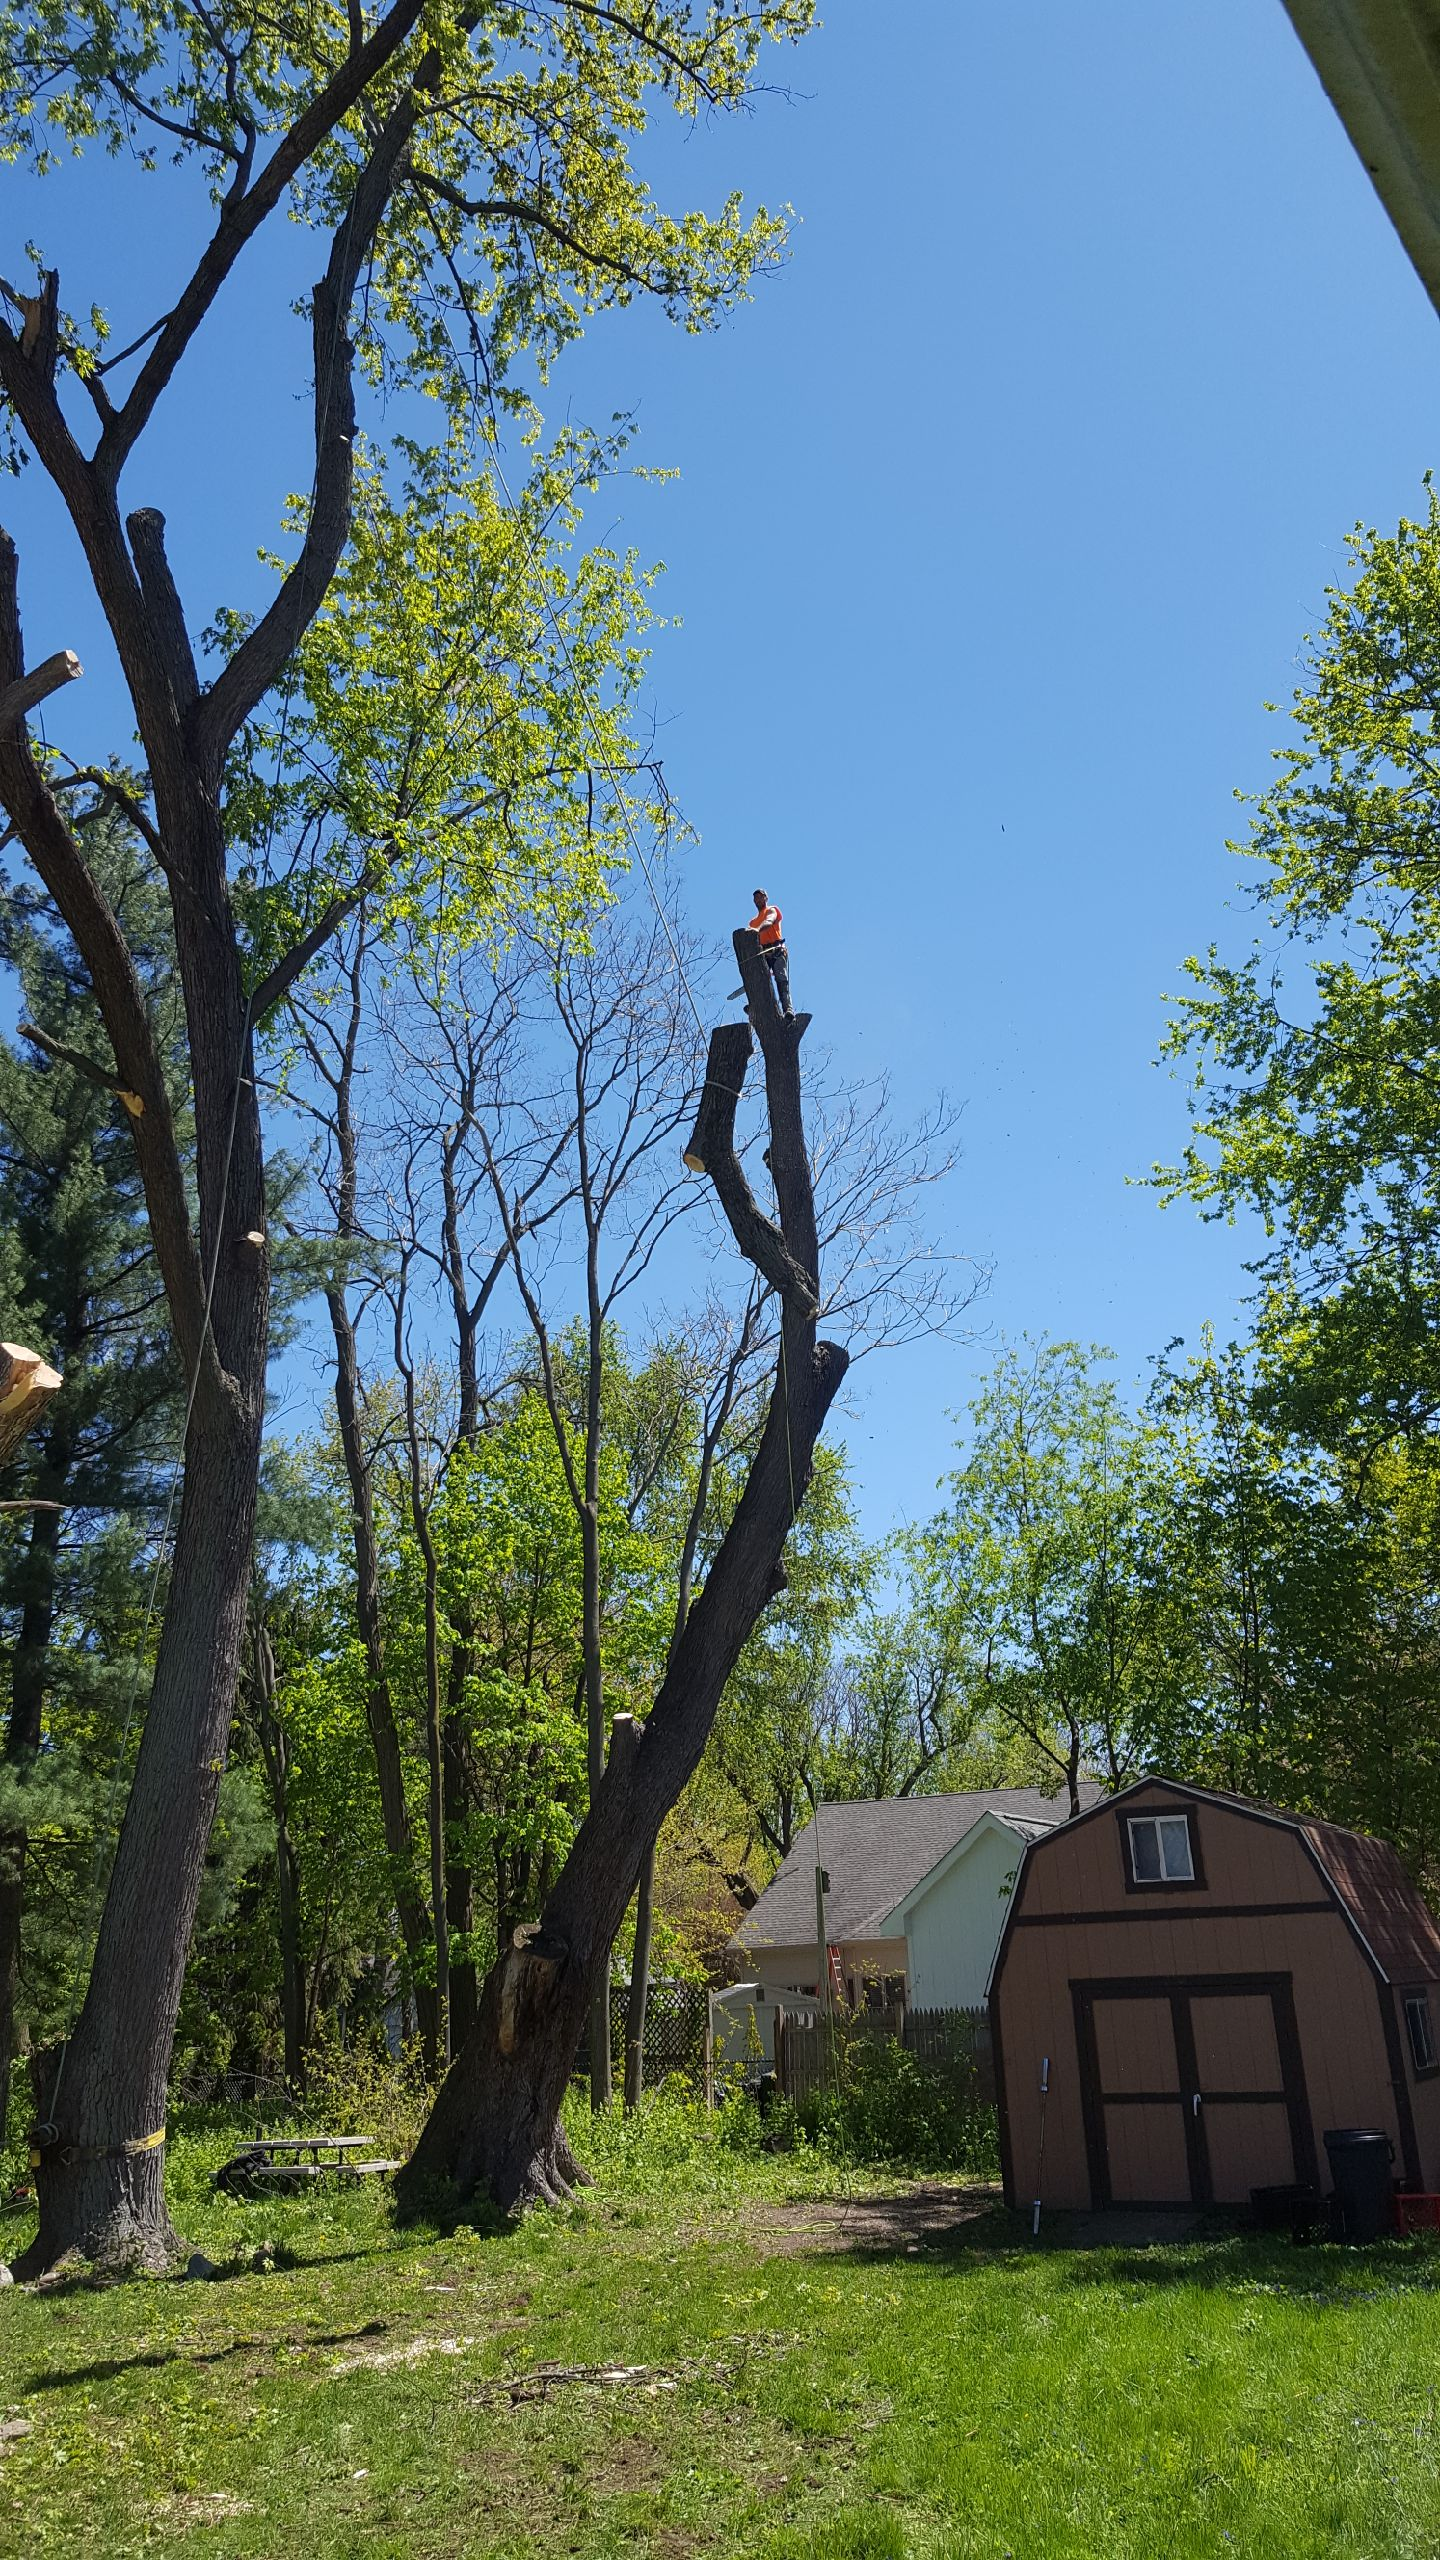 Coffman's Tree Service image 36